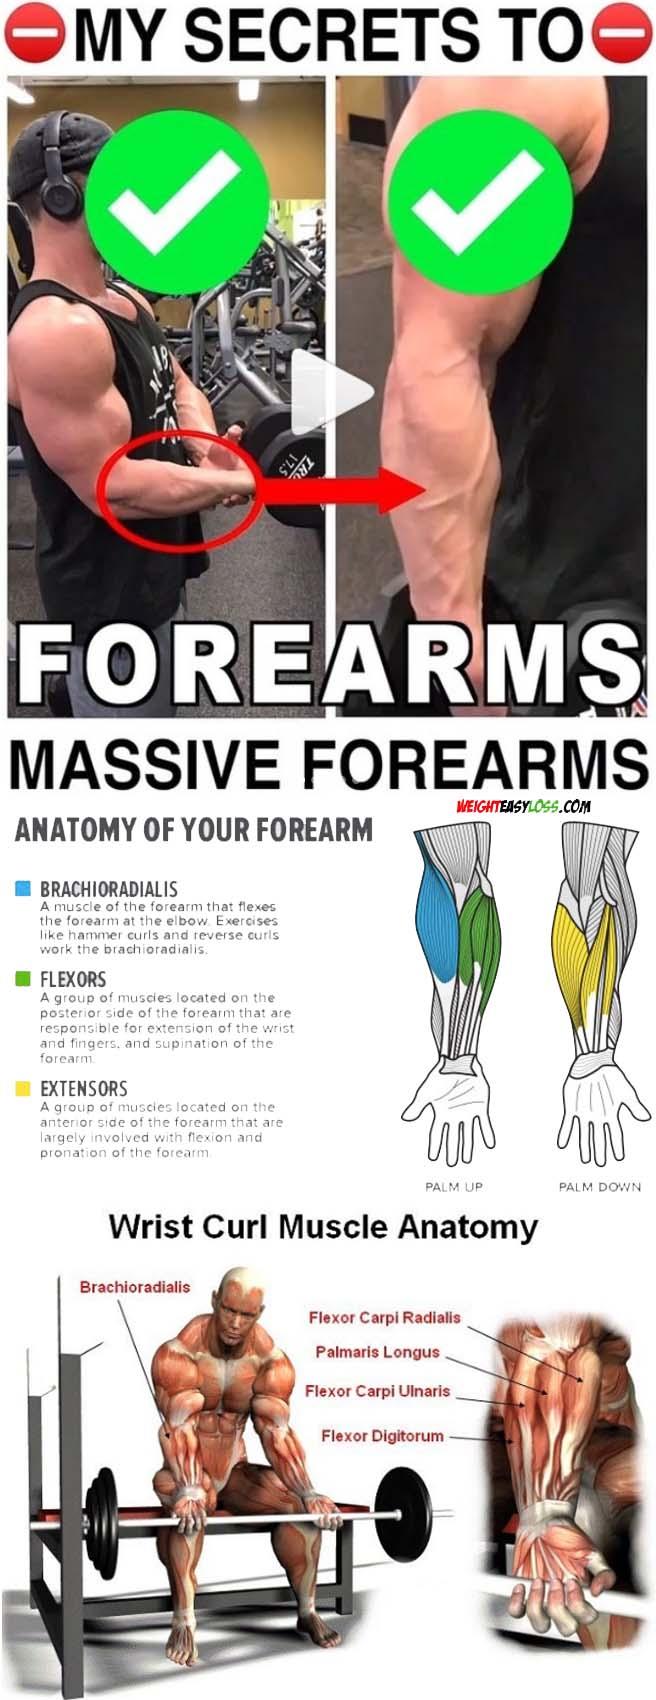 Dumbbell wrist flexion